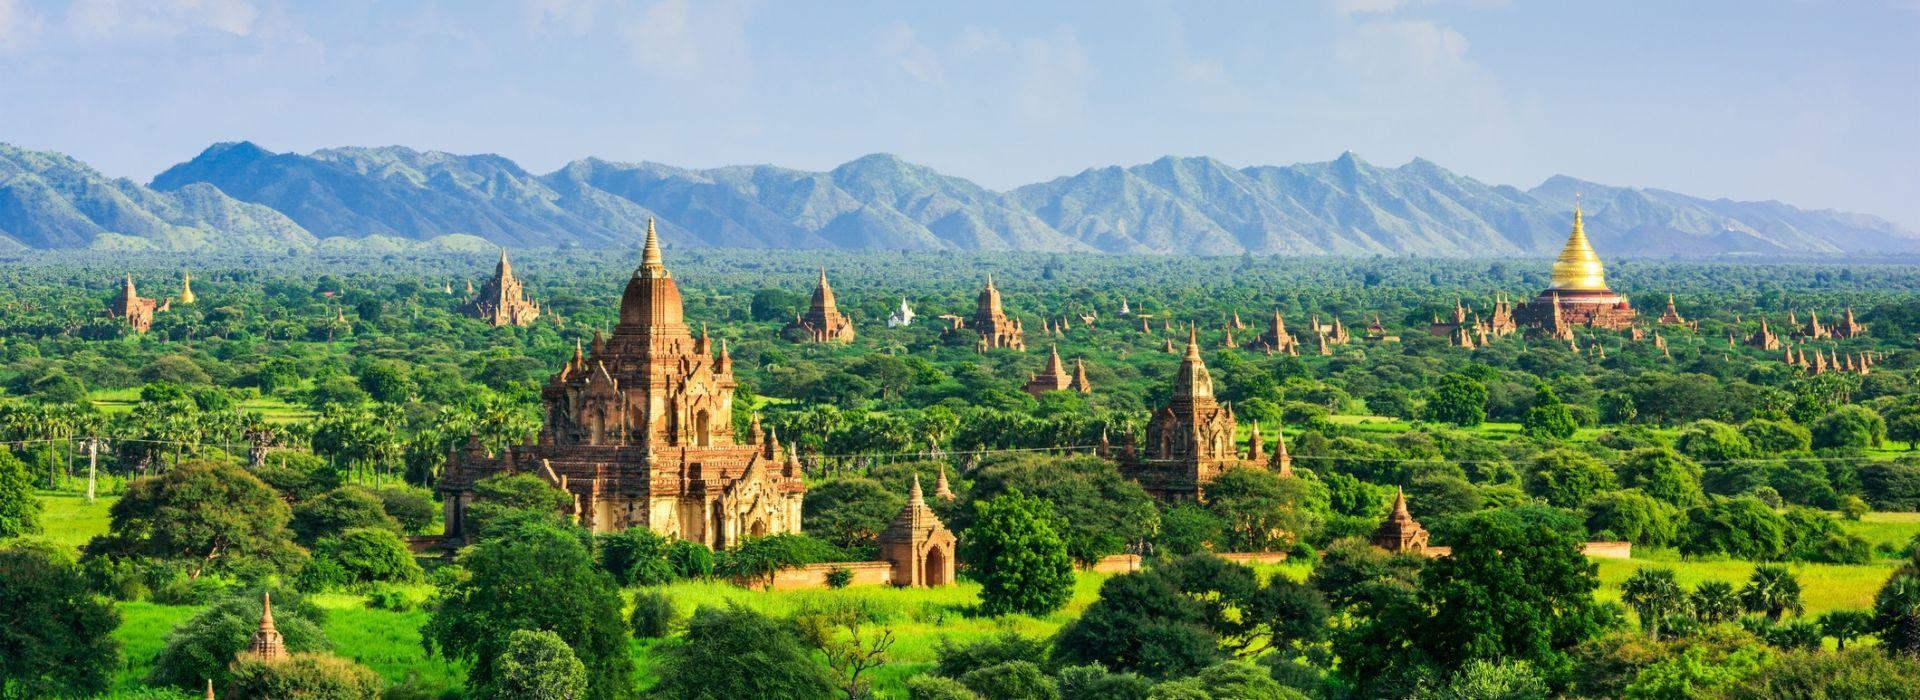 Adventure Tours in Mandalay